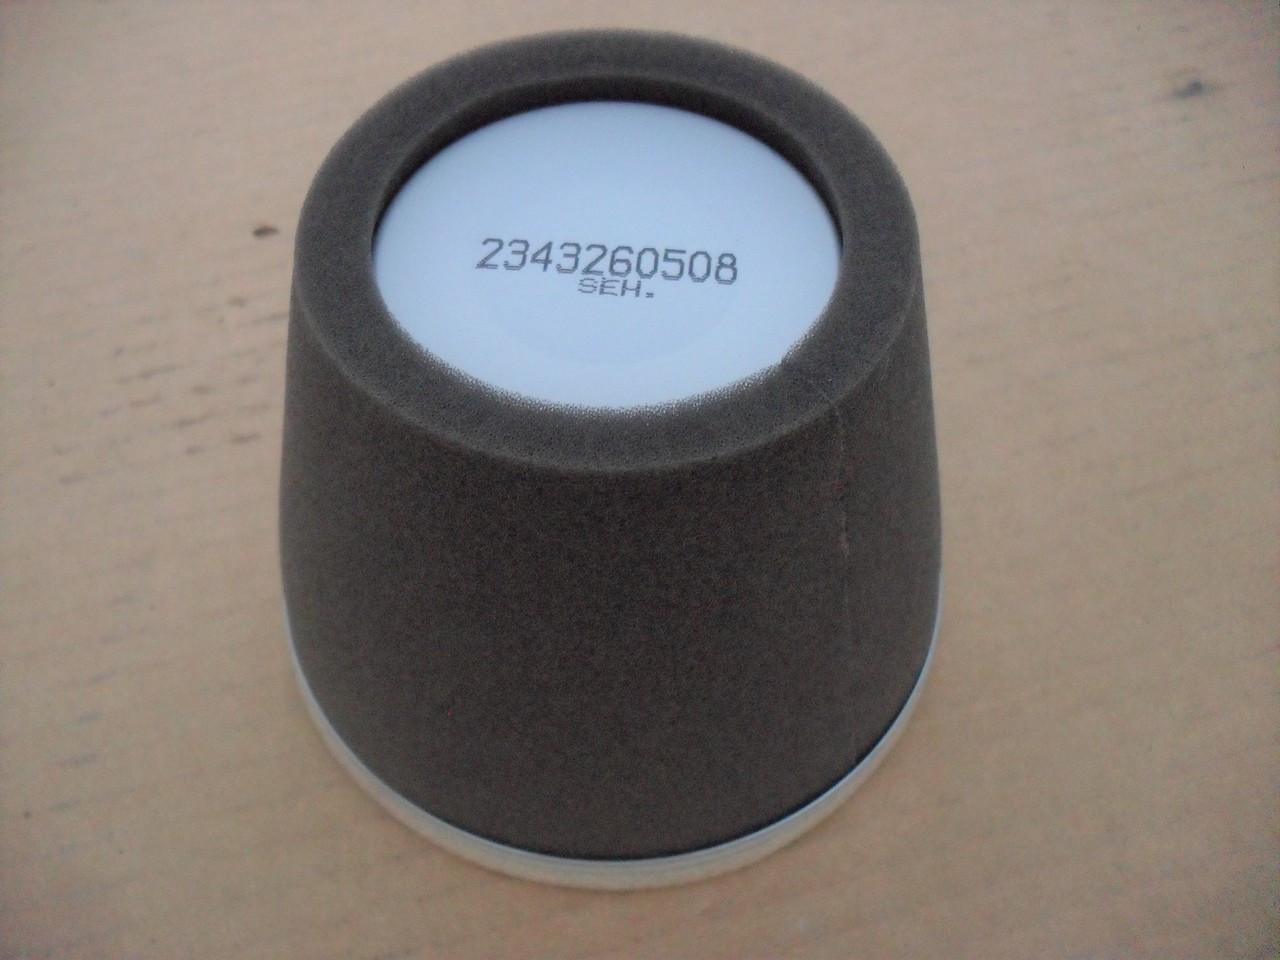 Air Filter for Subaru Robin EY28, EH25-2, EH30, EH34, 01404096, 2343260307, 2343260407, 2343260417, 2343260508, 2343260707, 2343600407, 0140-4096, 234-32603-07, 234-32604-07, 234-32604-17, 234-32605-08, 234-32607-07, 234-36004-07